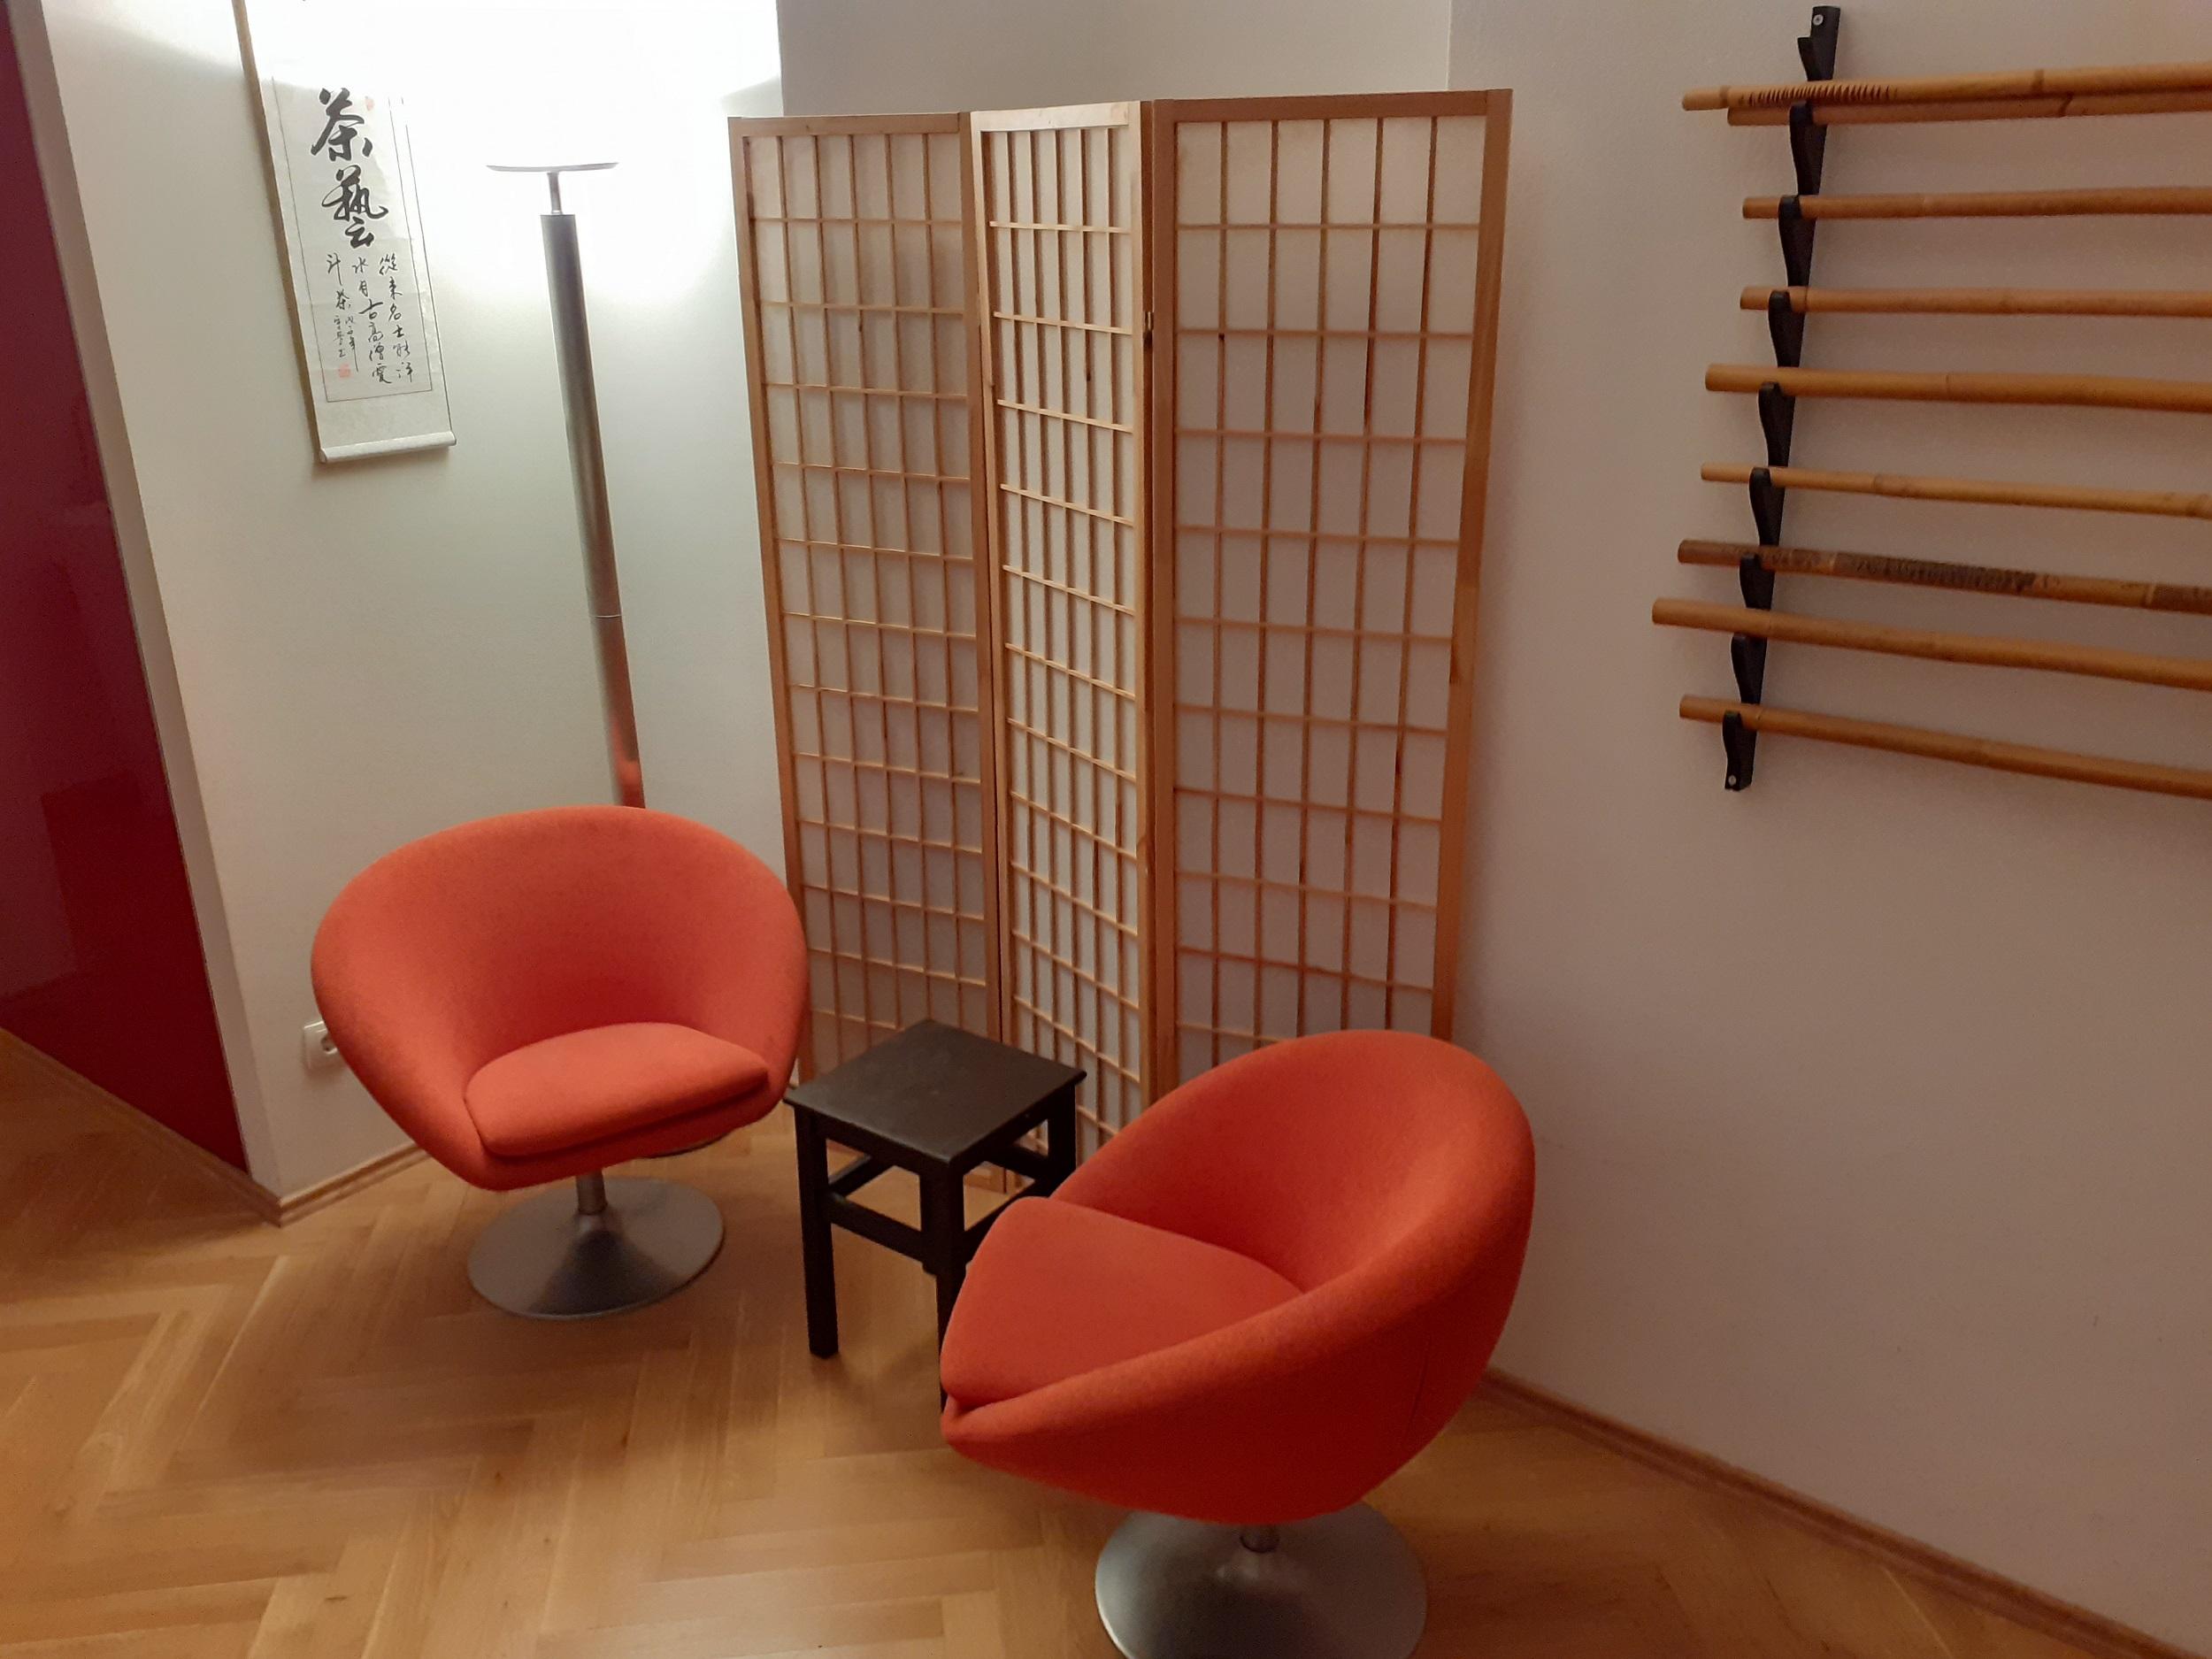 Seminarraum Miete, Studio Miete, Behandlungsraum, Wien, Yoga, Gymnastik, Tanz